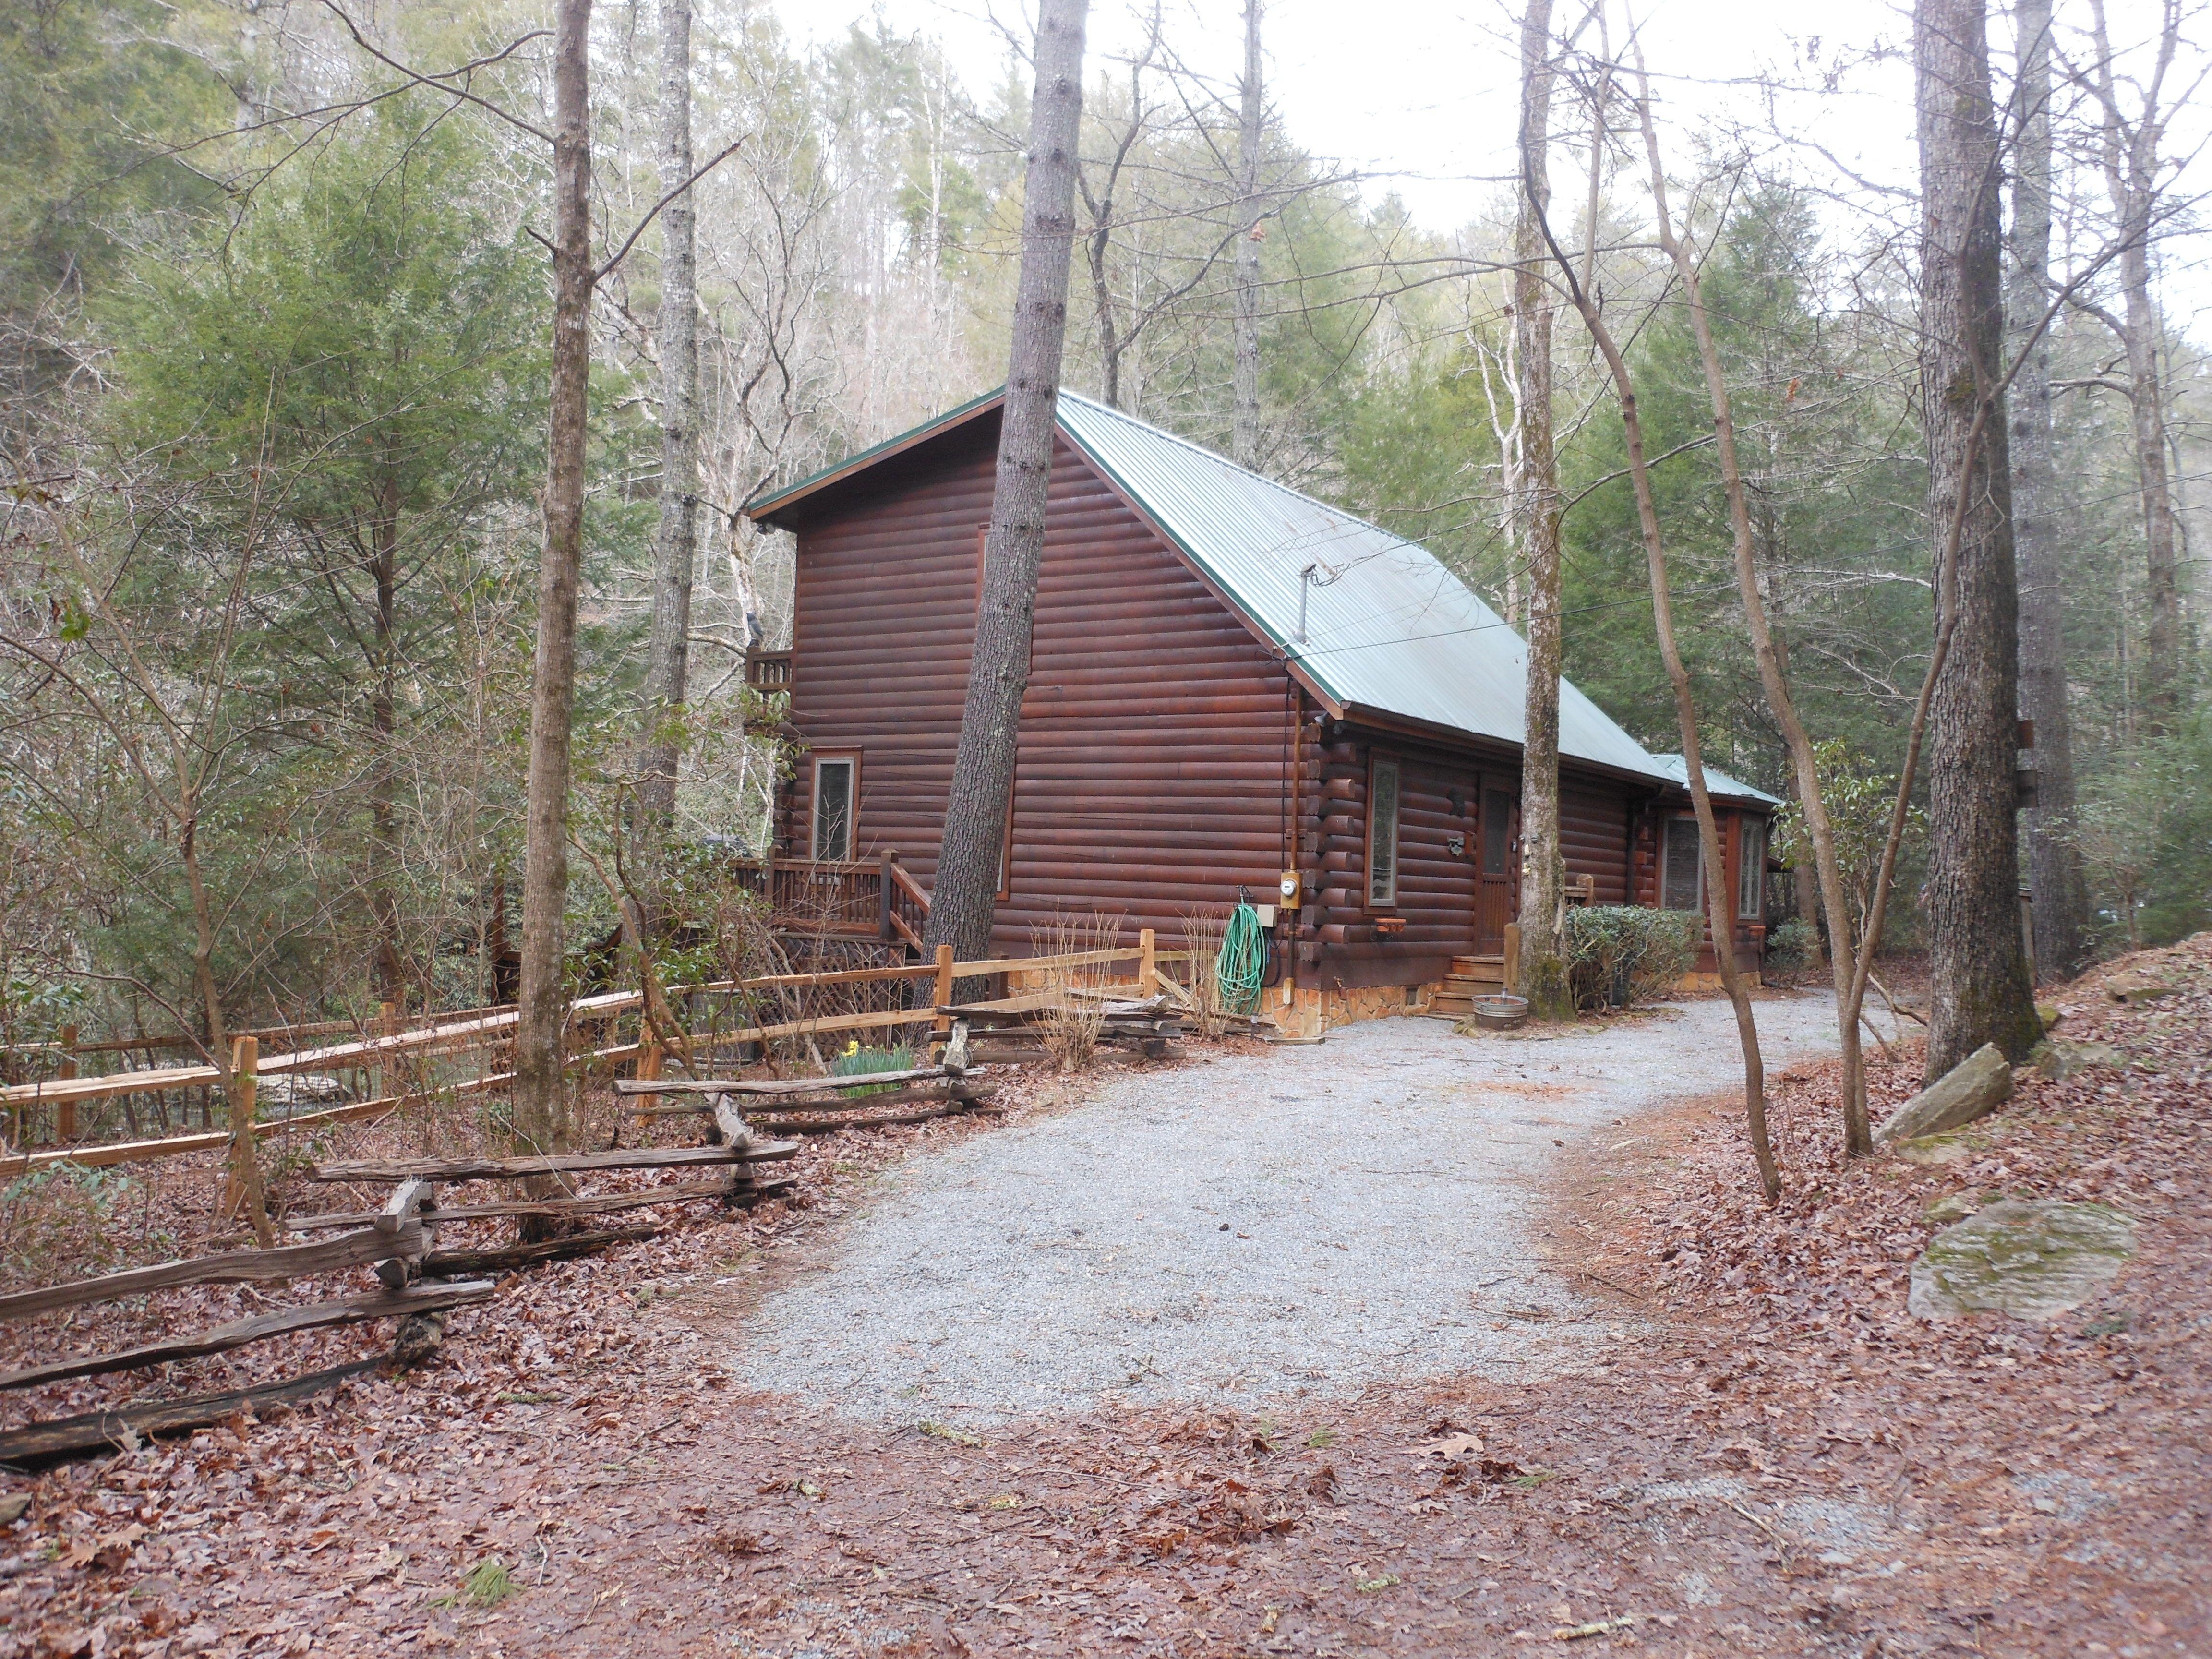 ga forever room ellijay rock sliding living cabins large property item in friday